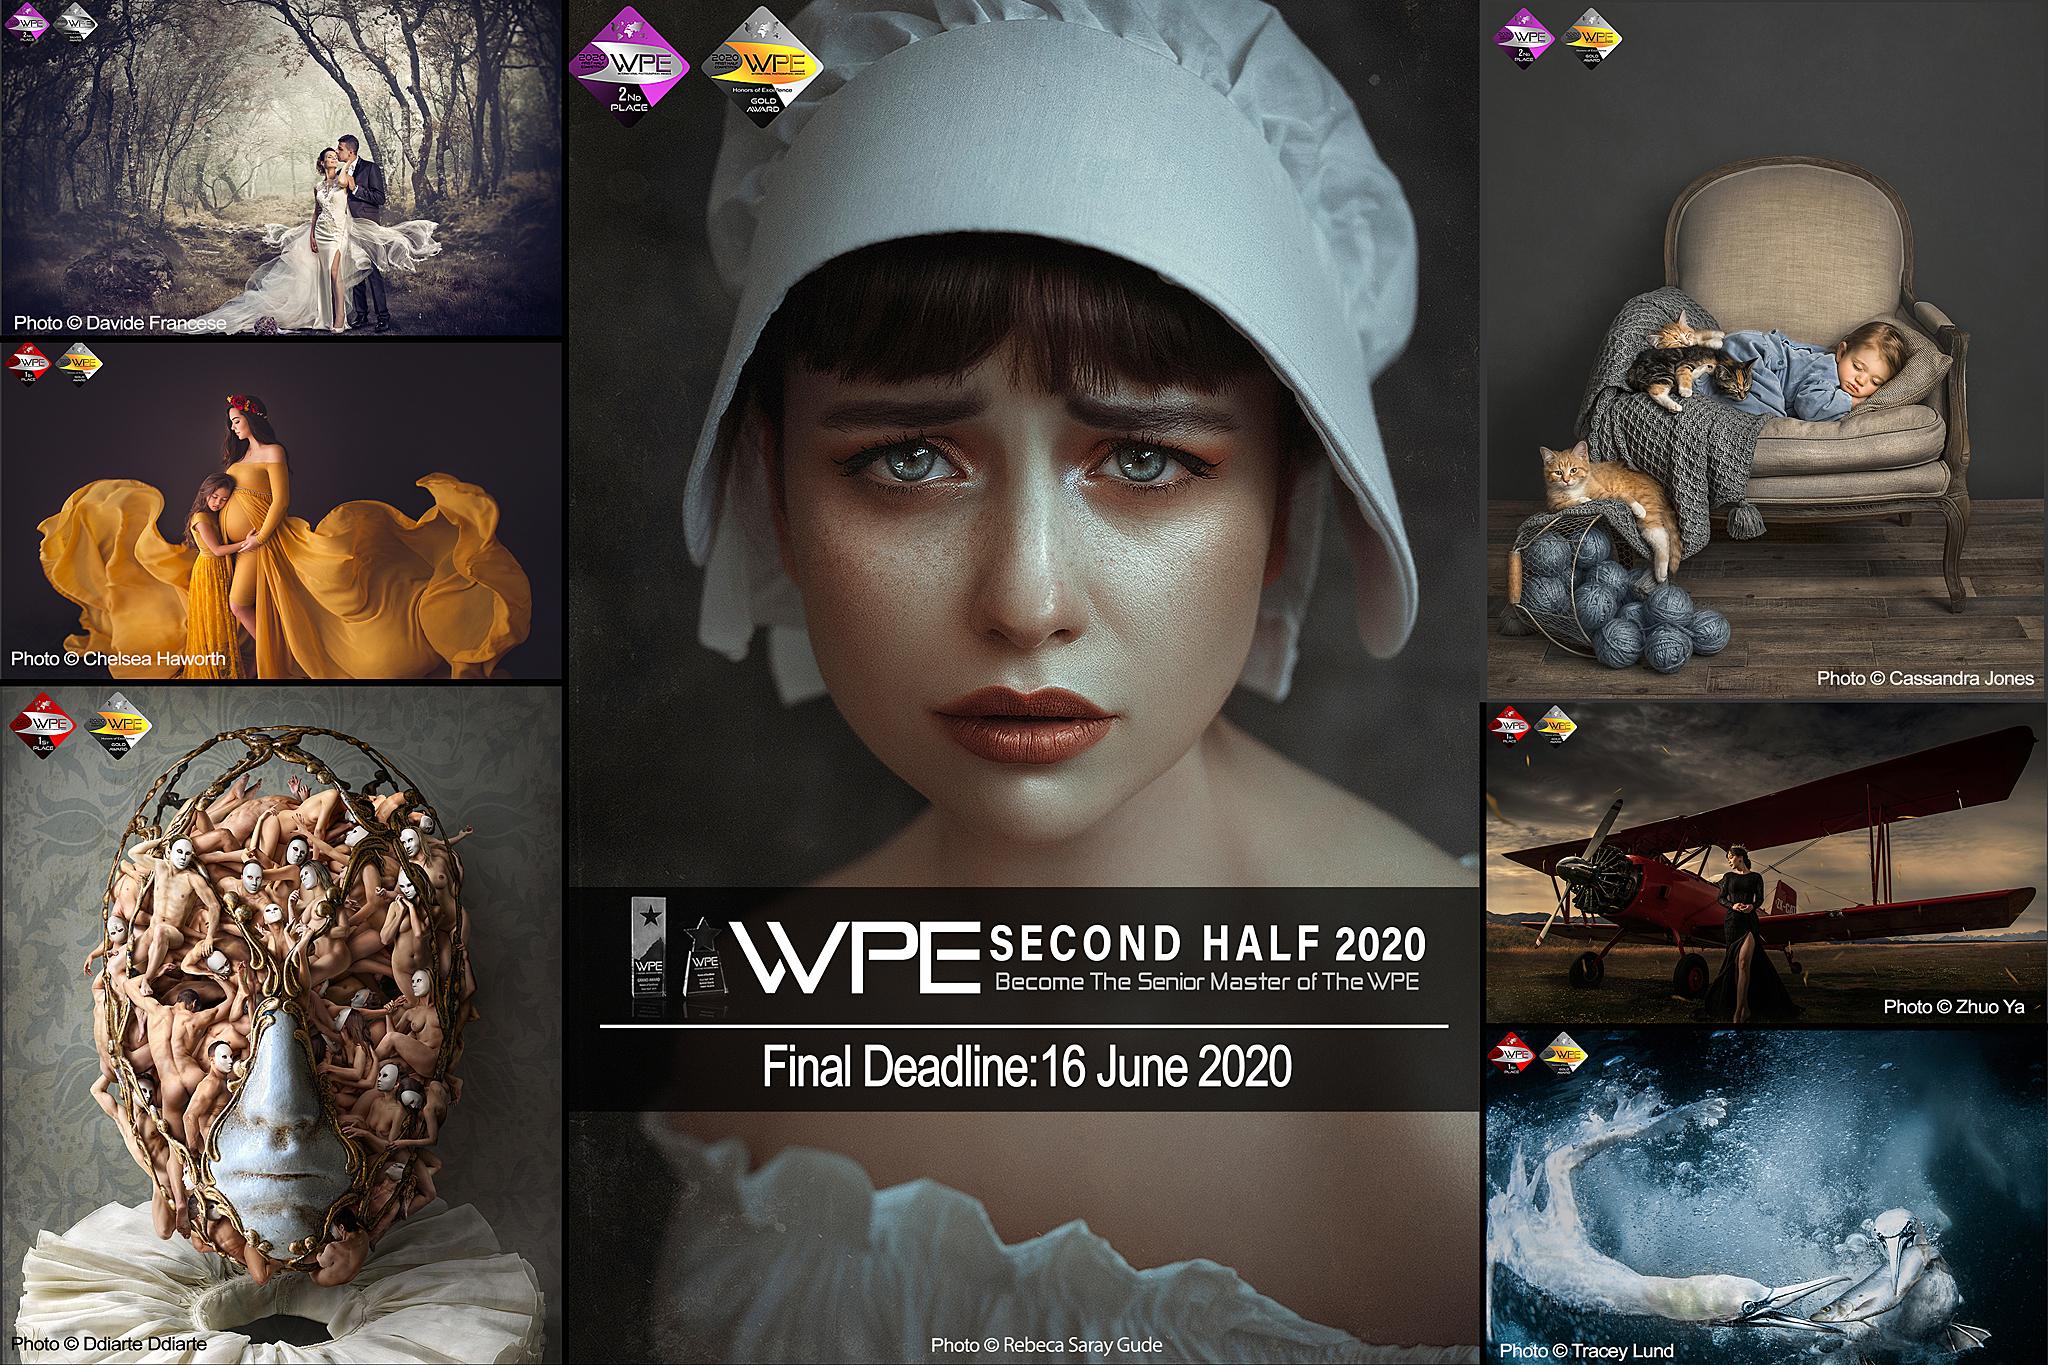 WPE AWARDS SECOND HALF 2020